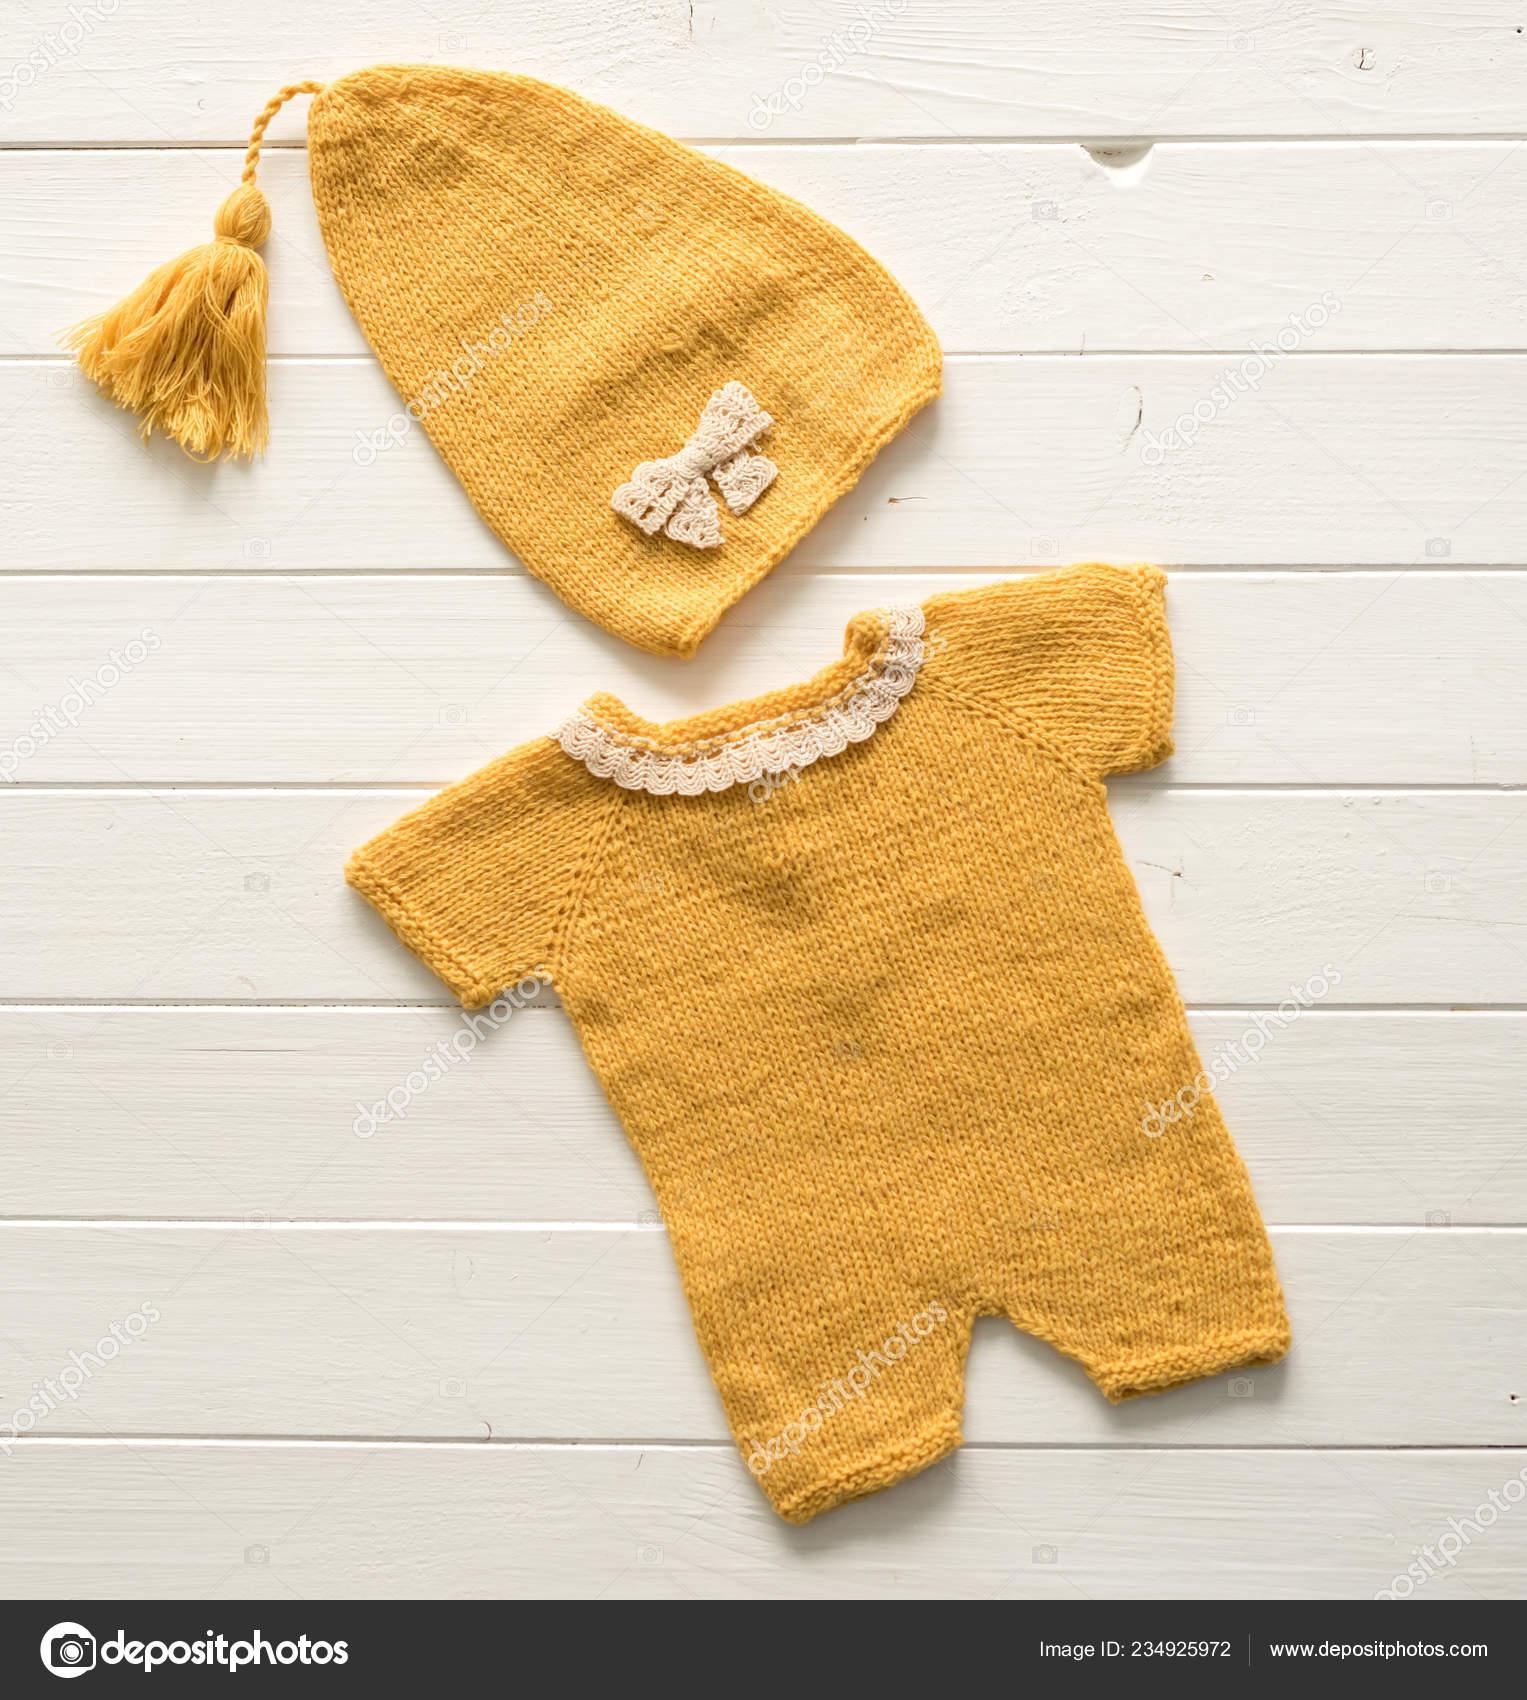 d4f2e405a290 Πολύχρωμα μικρά πλεκτά ρούχα για τα μωρά που αποτελείται από το λευκό  πίνακα — Εικόνα από ...